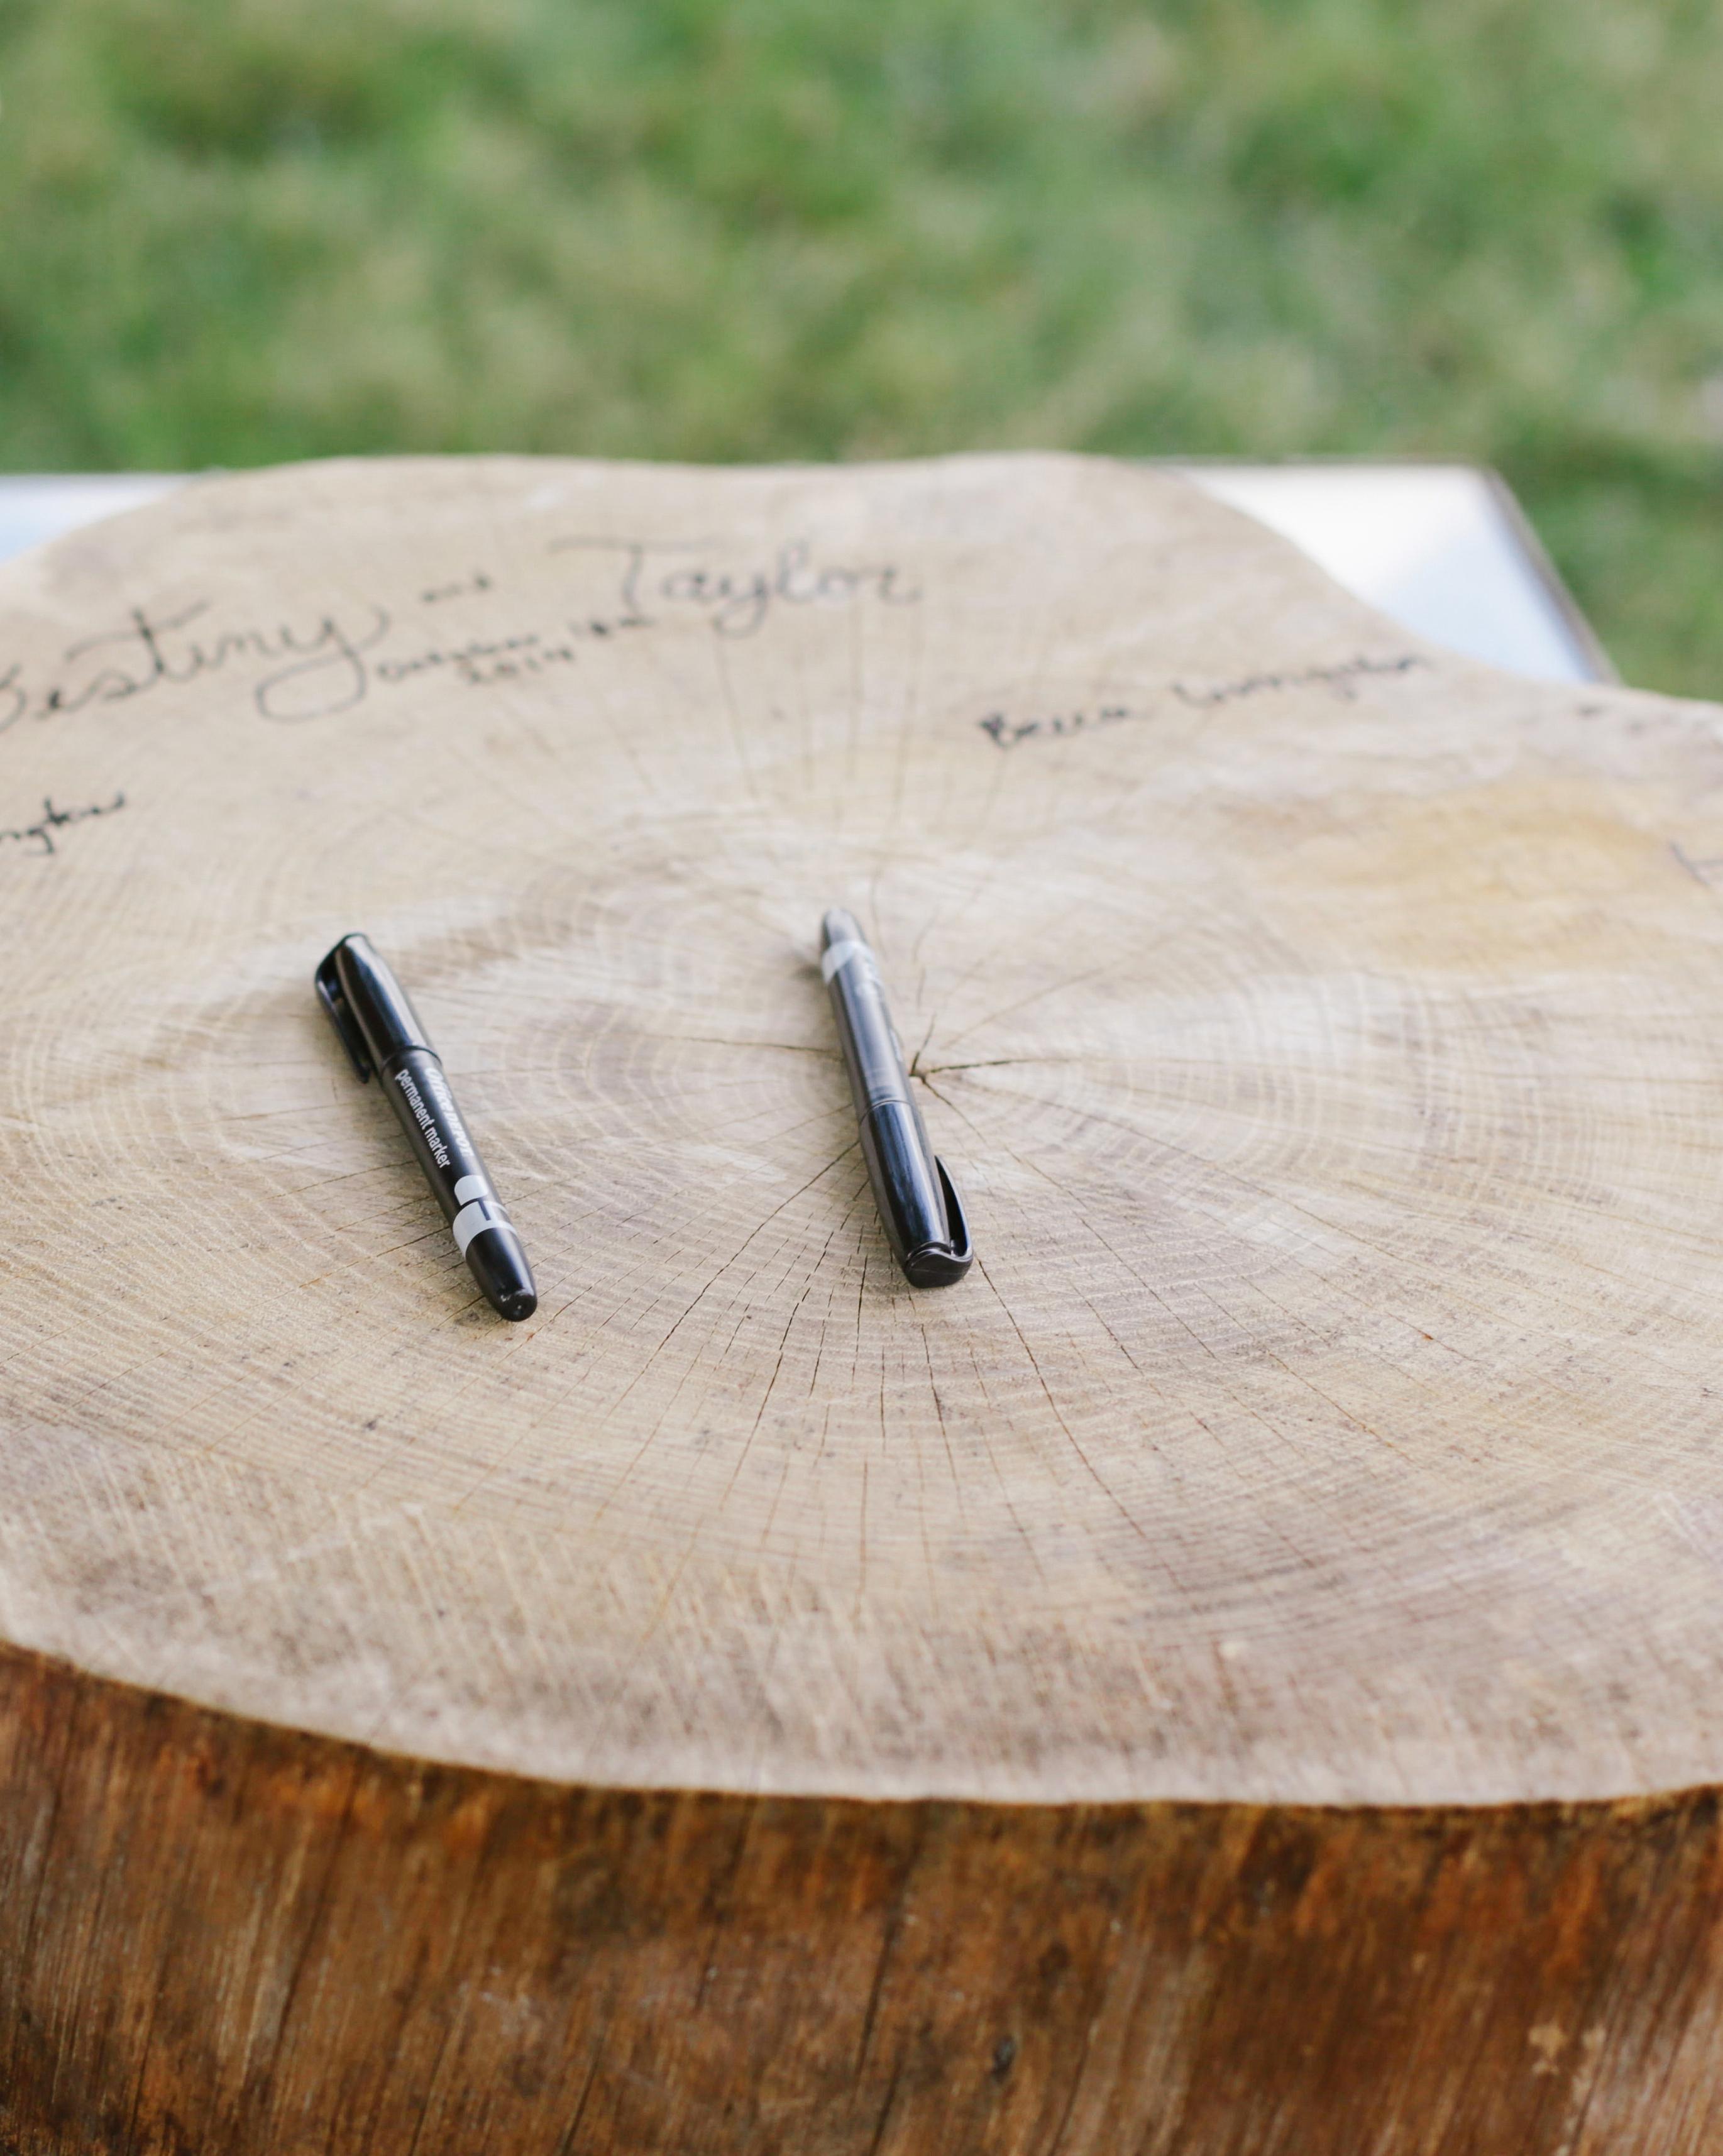 destiny-taylor-wedding-stump-212-s112347-1115.jpg